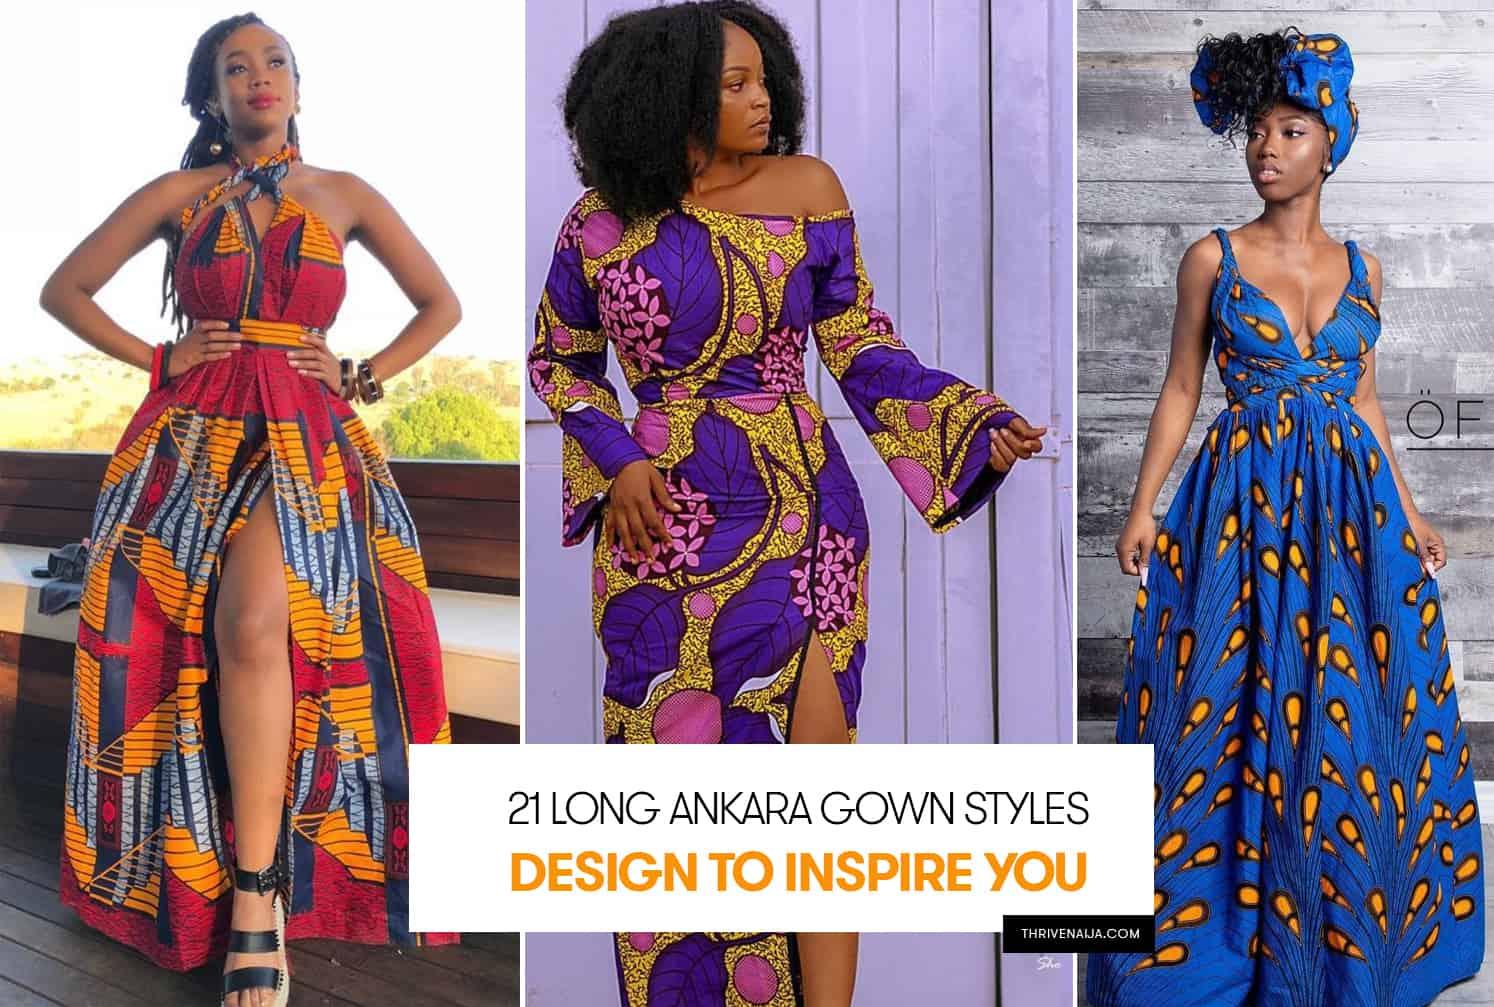 809a144d8239b0 26 Long Ankara Gown Styles Design To Inspire You   Thrive Naija